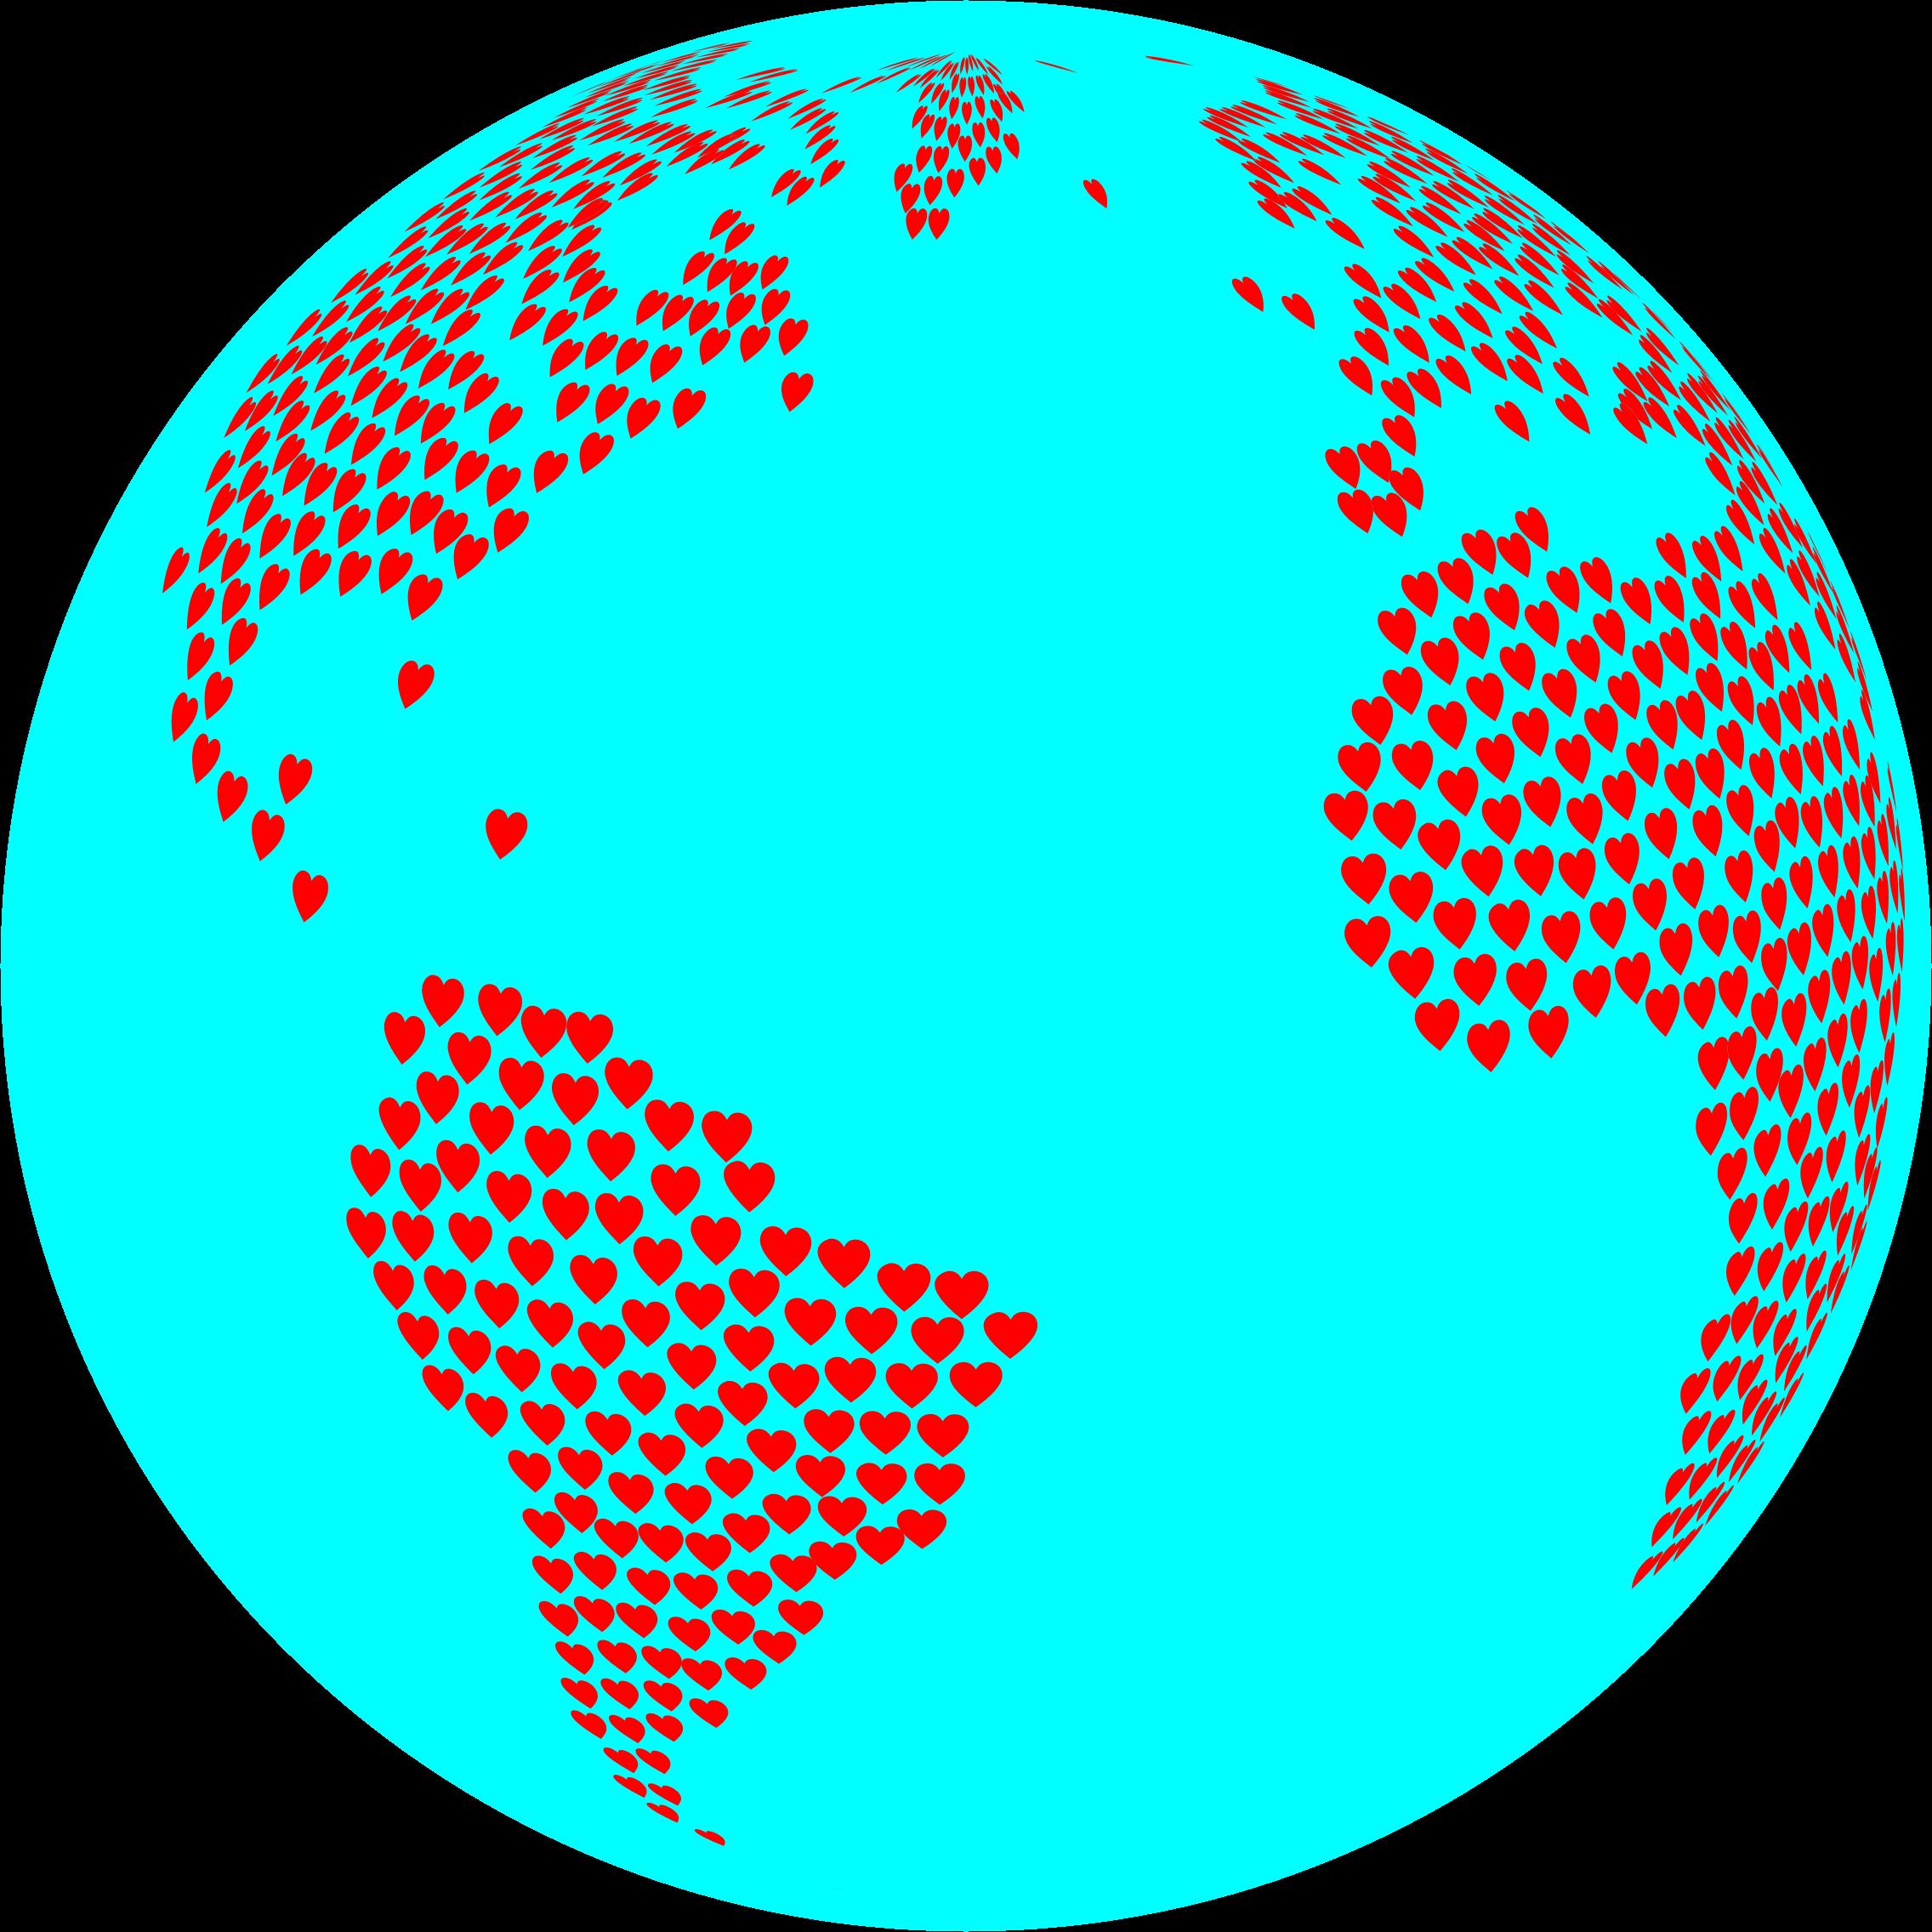 Hearts globe with big. Circle clipart ocean